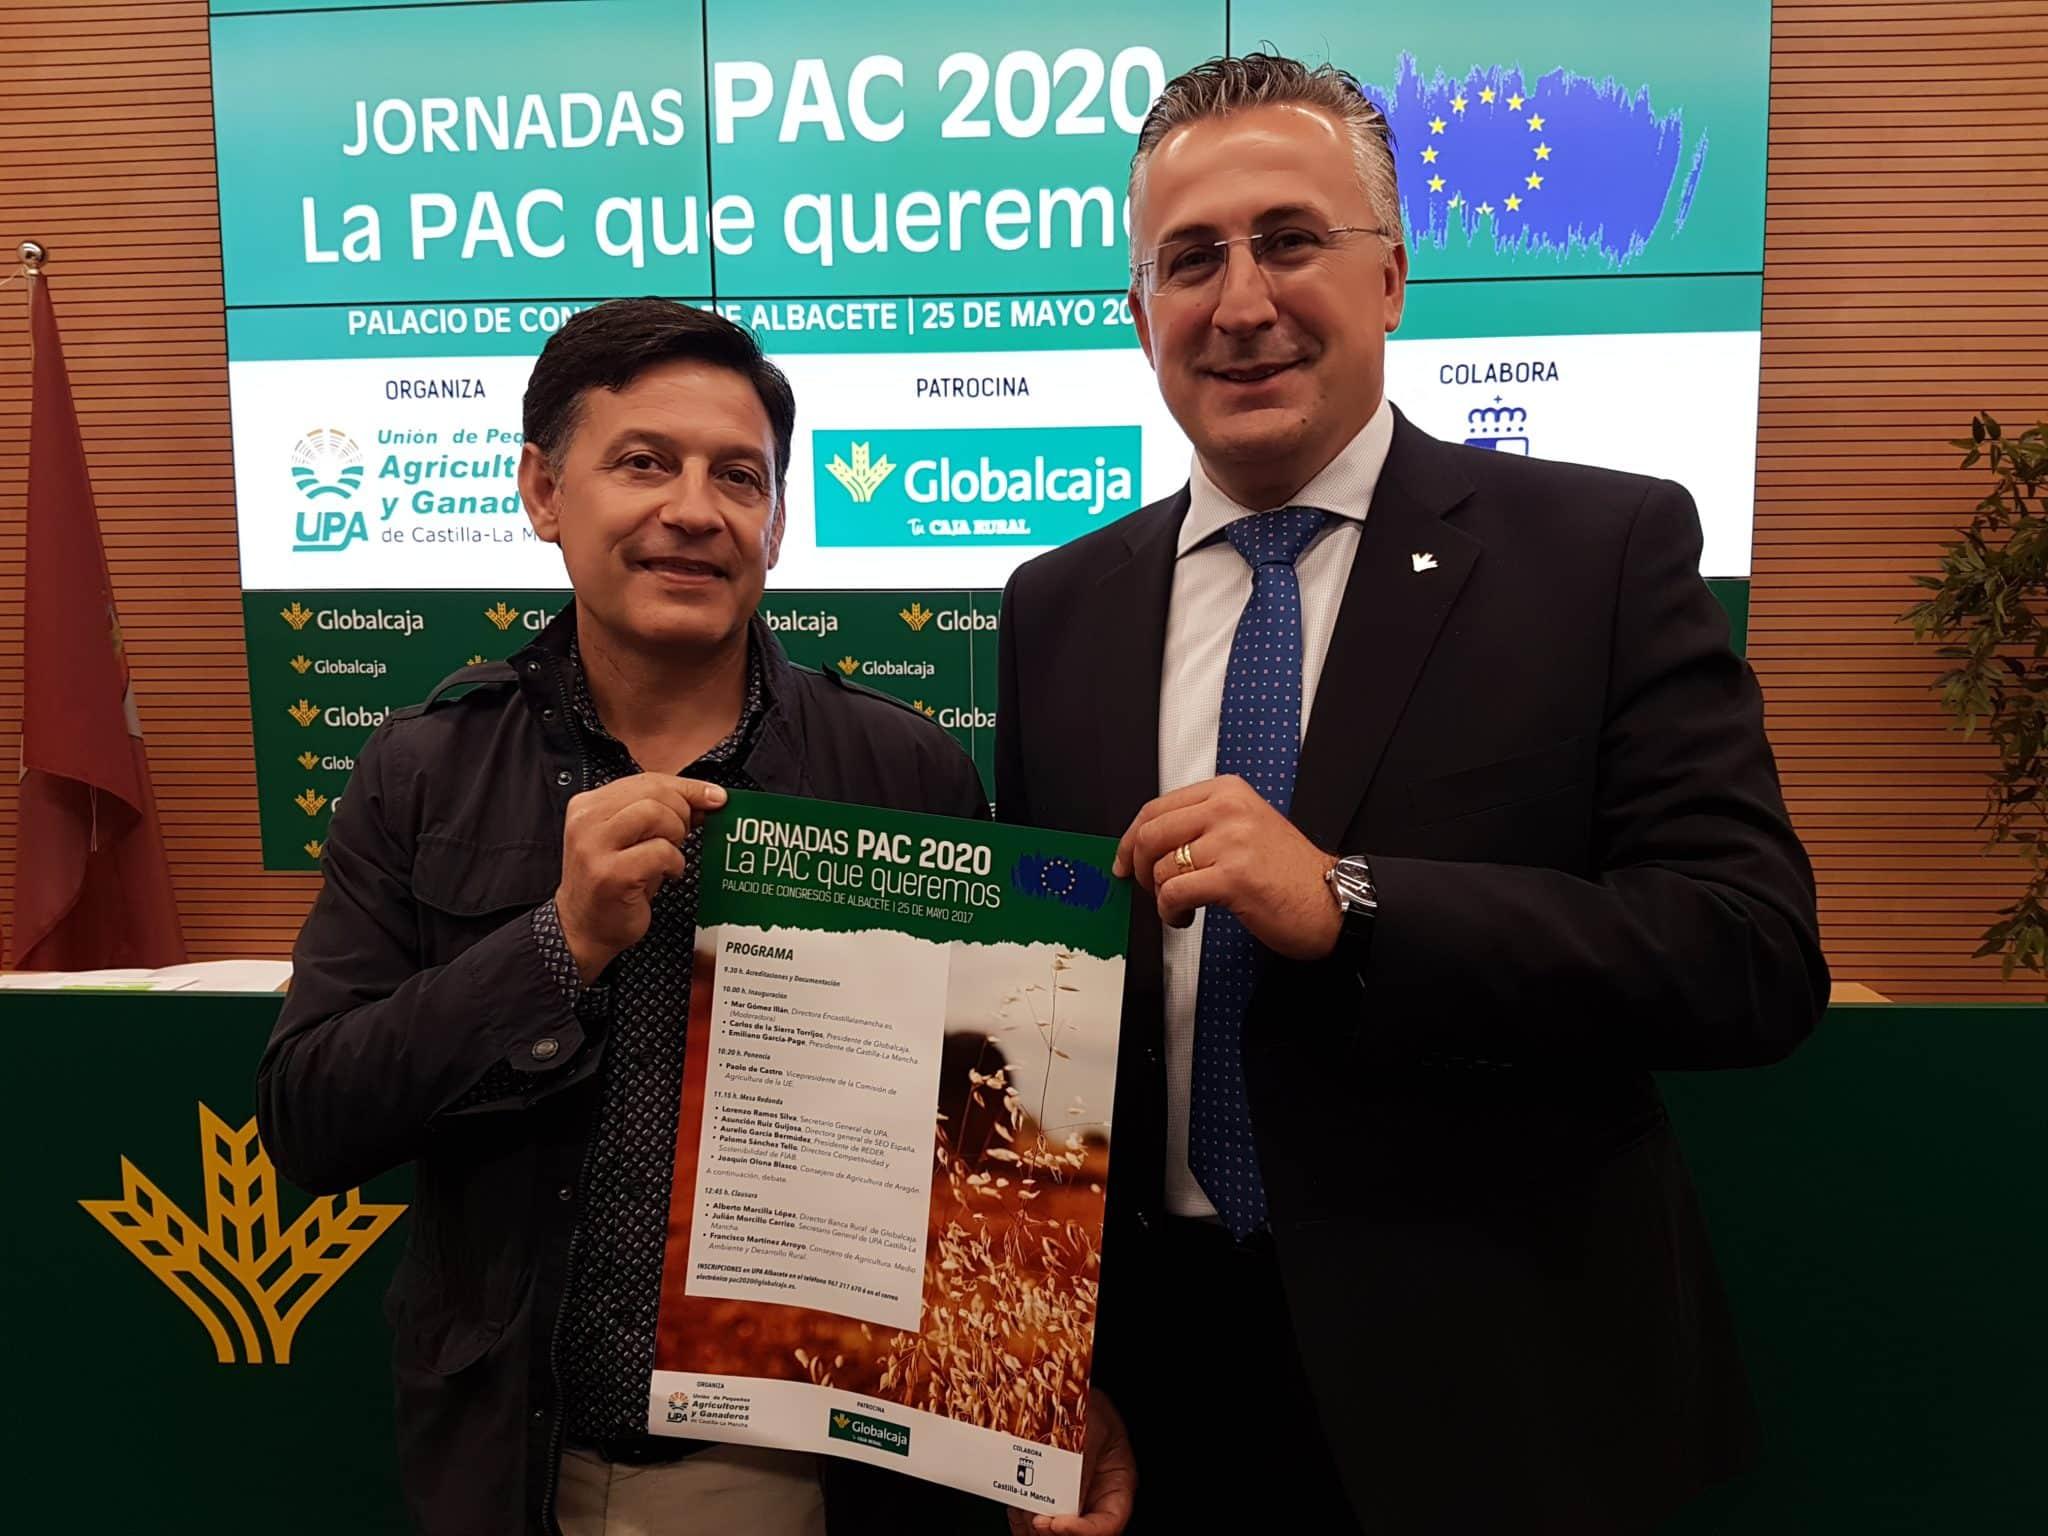 https://blog.globalcaja.es/wp-content/uploads/2017/05/PAC-Globalcaja.jpg